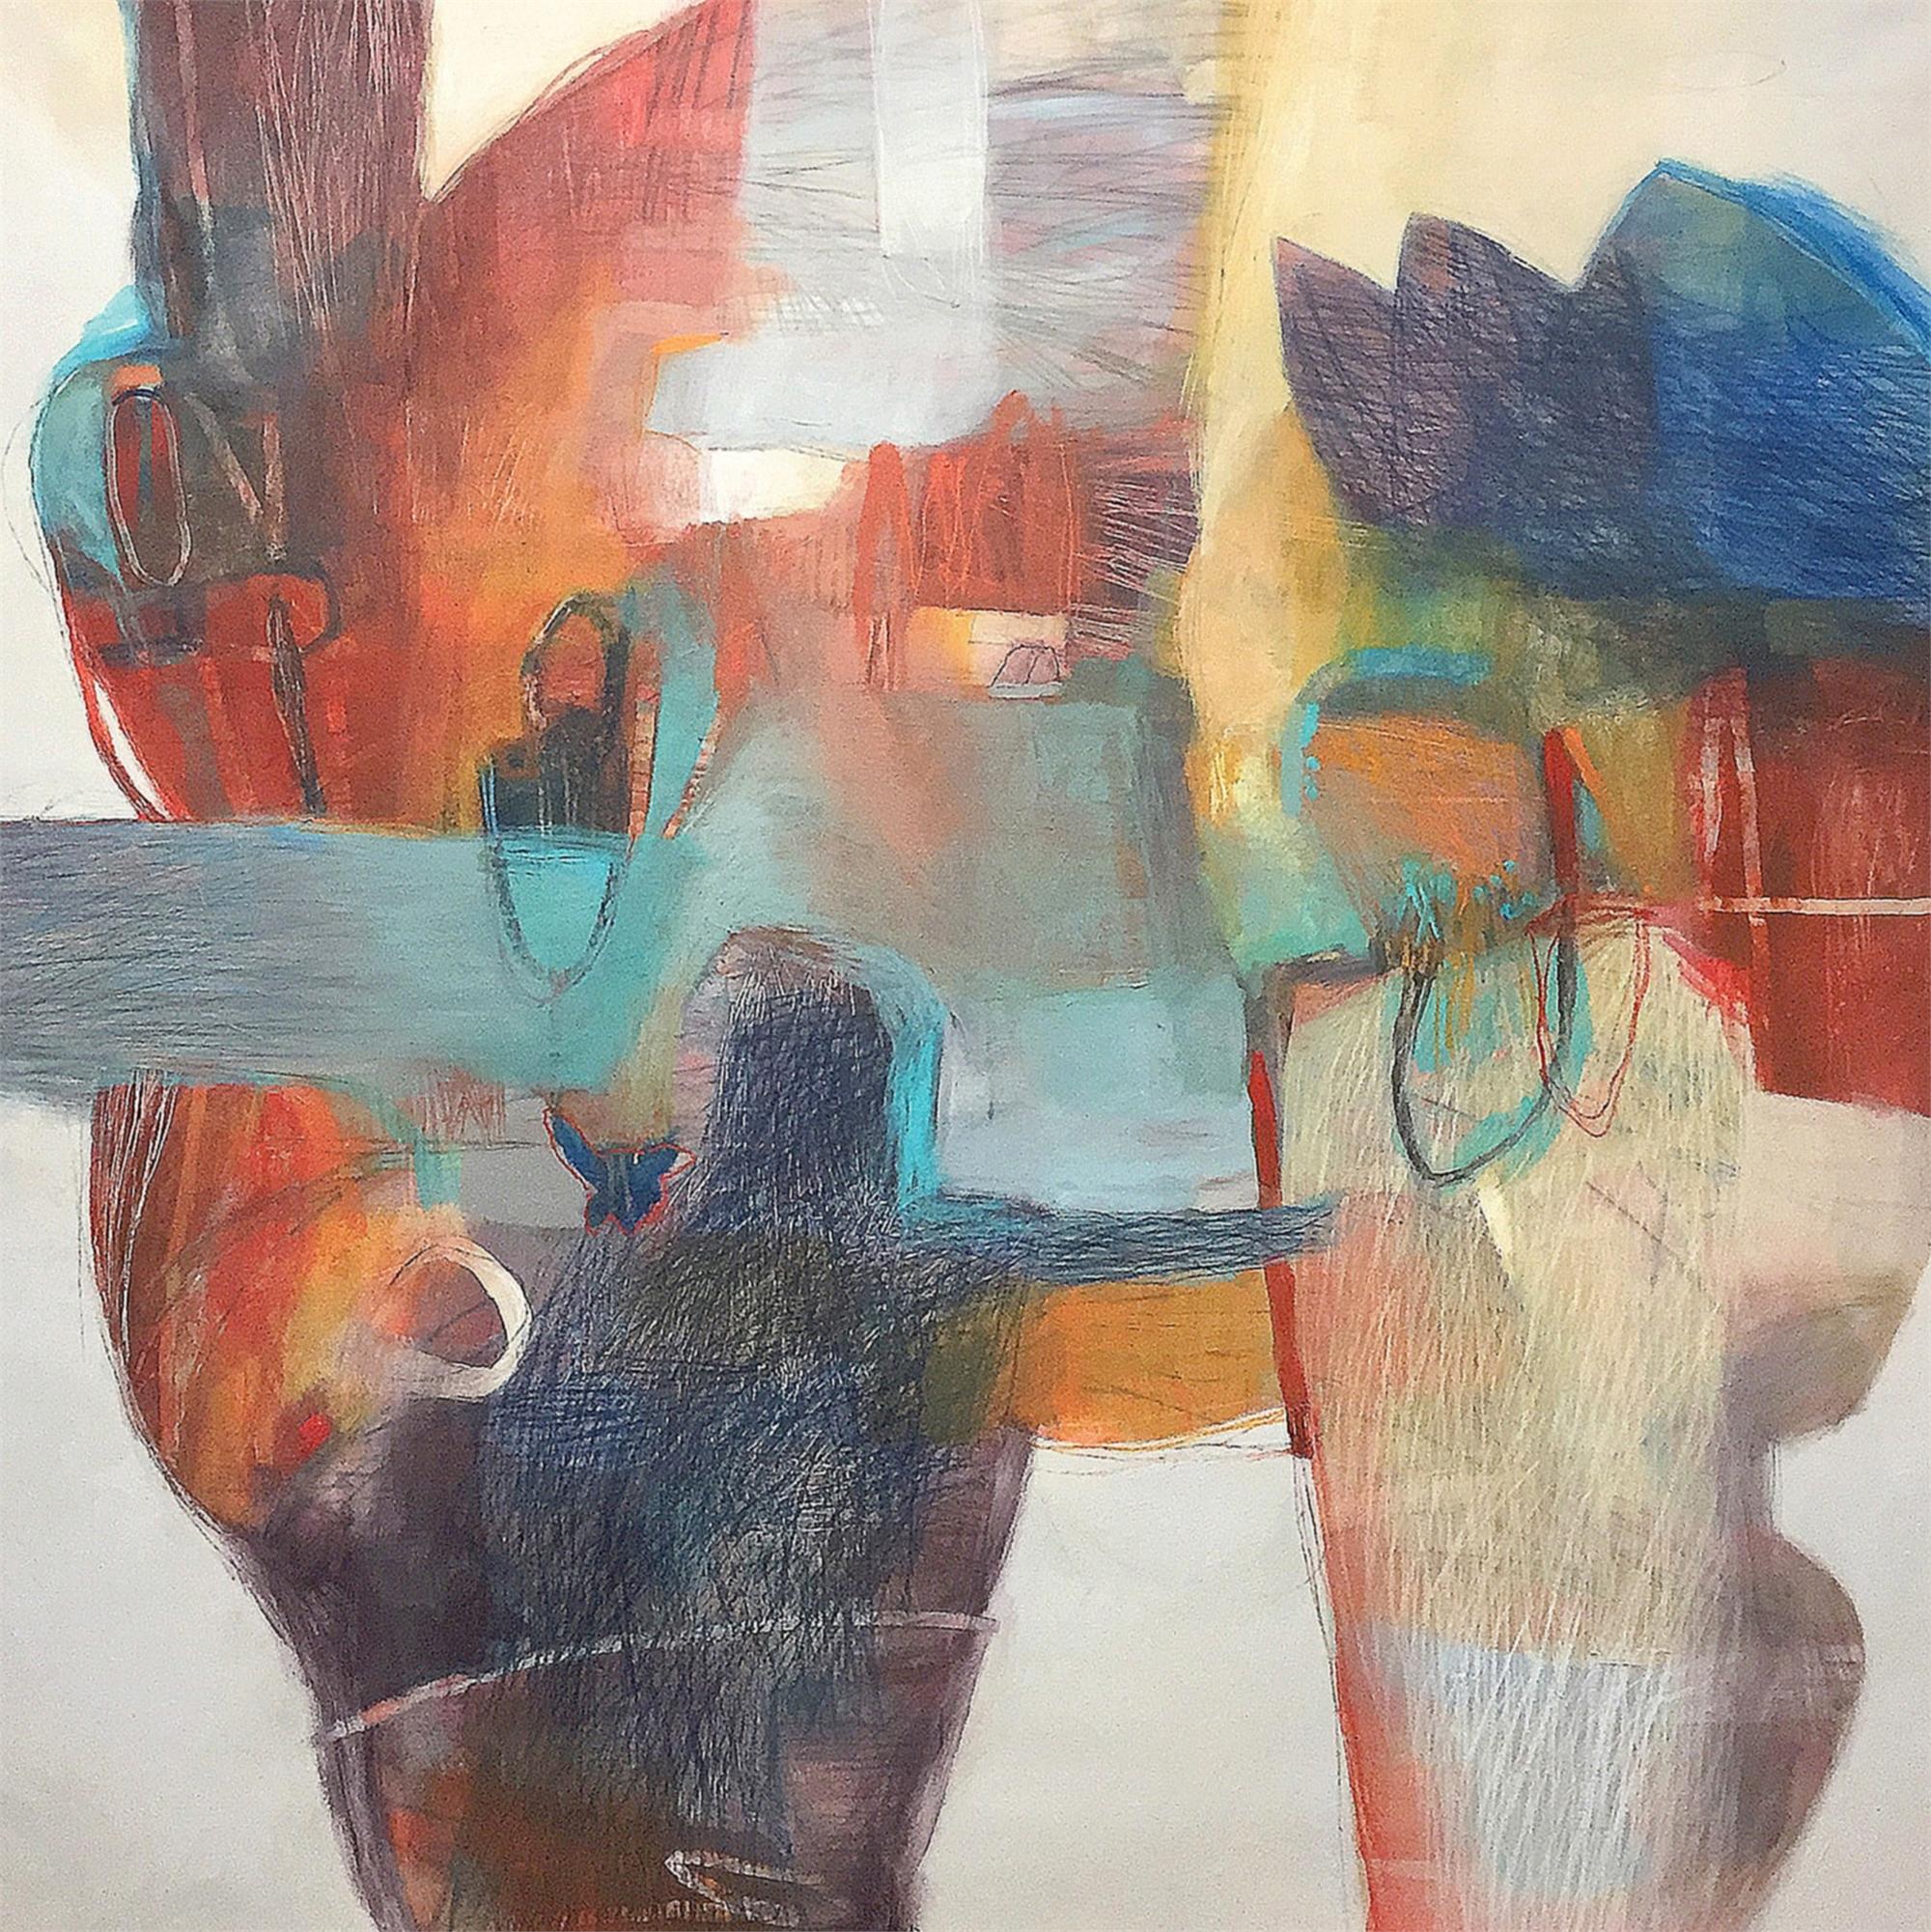 Untitled 198733 by Karen Roehl